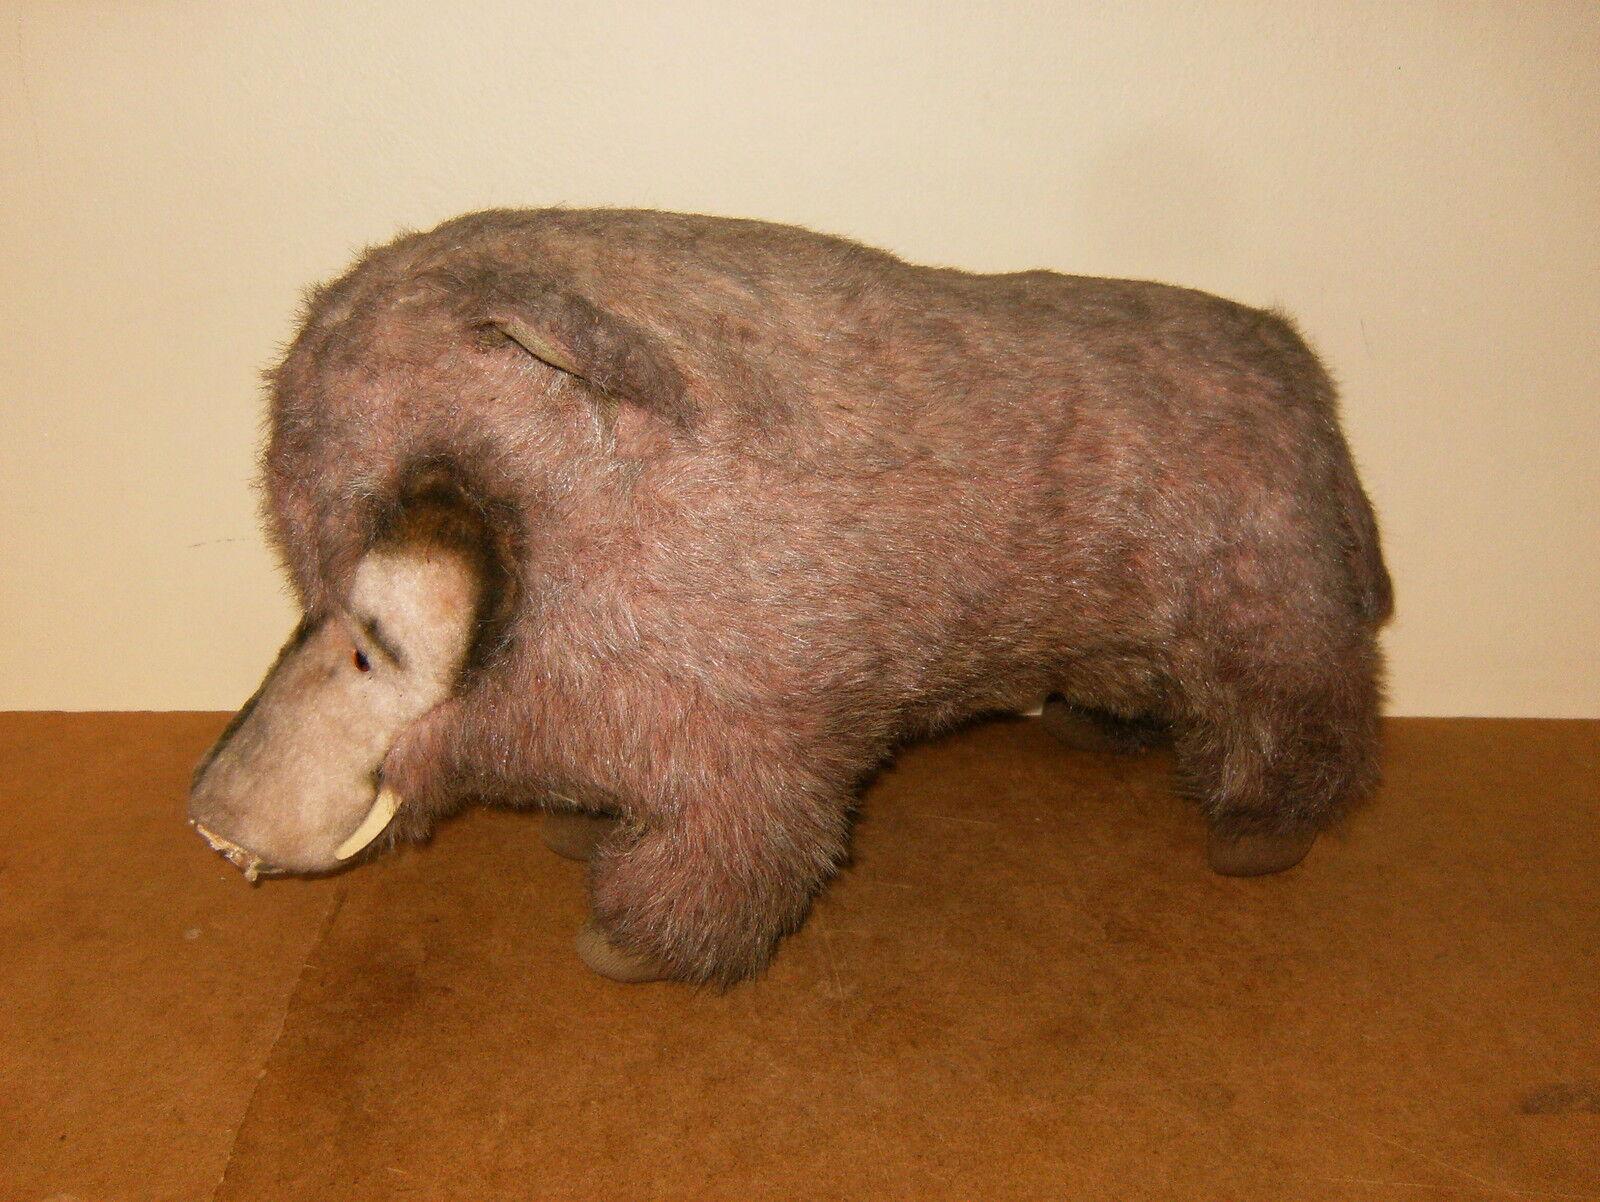 Ancienne peluche sanglier 40cm - HERMANN - vintage stuffed boar 15.7 inches